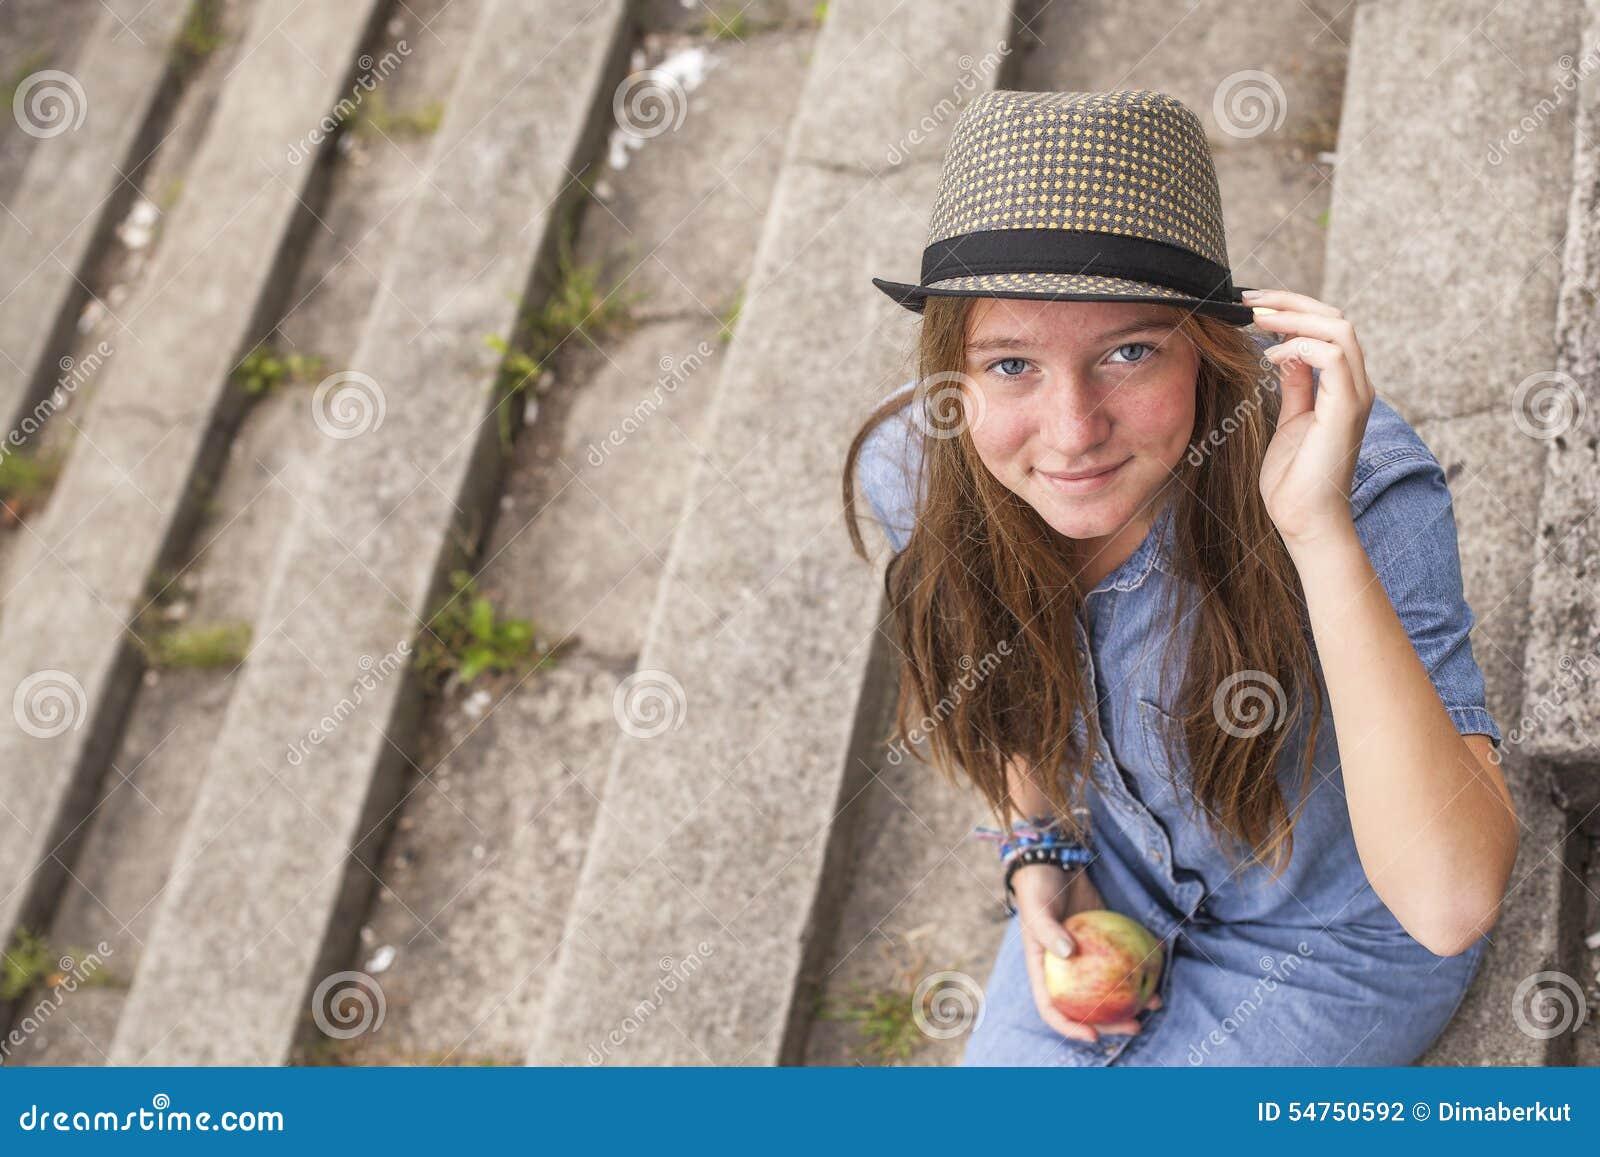 девушка с верху на камеру